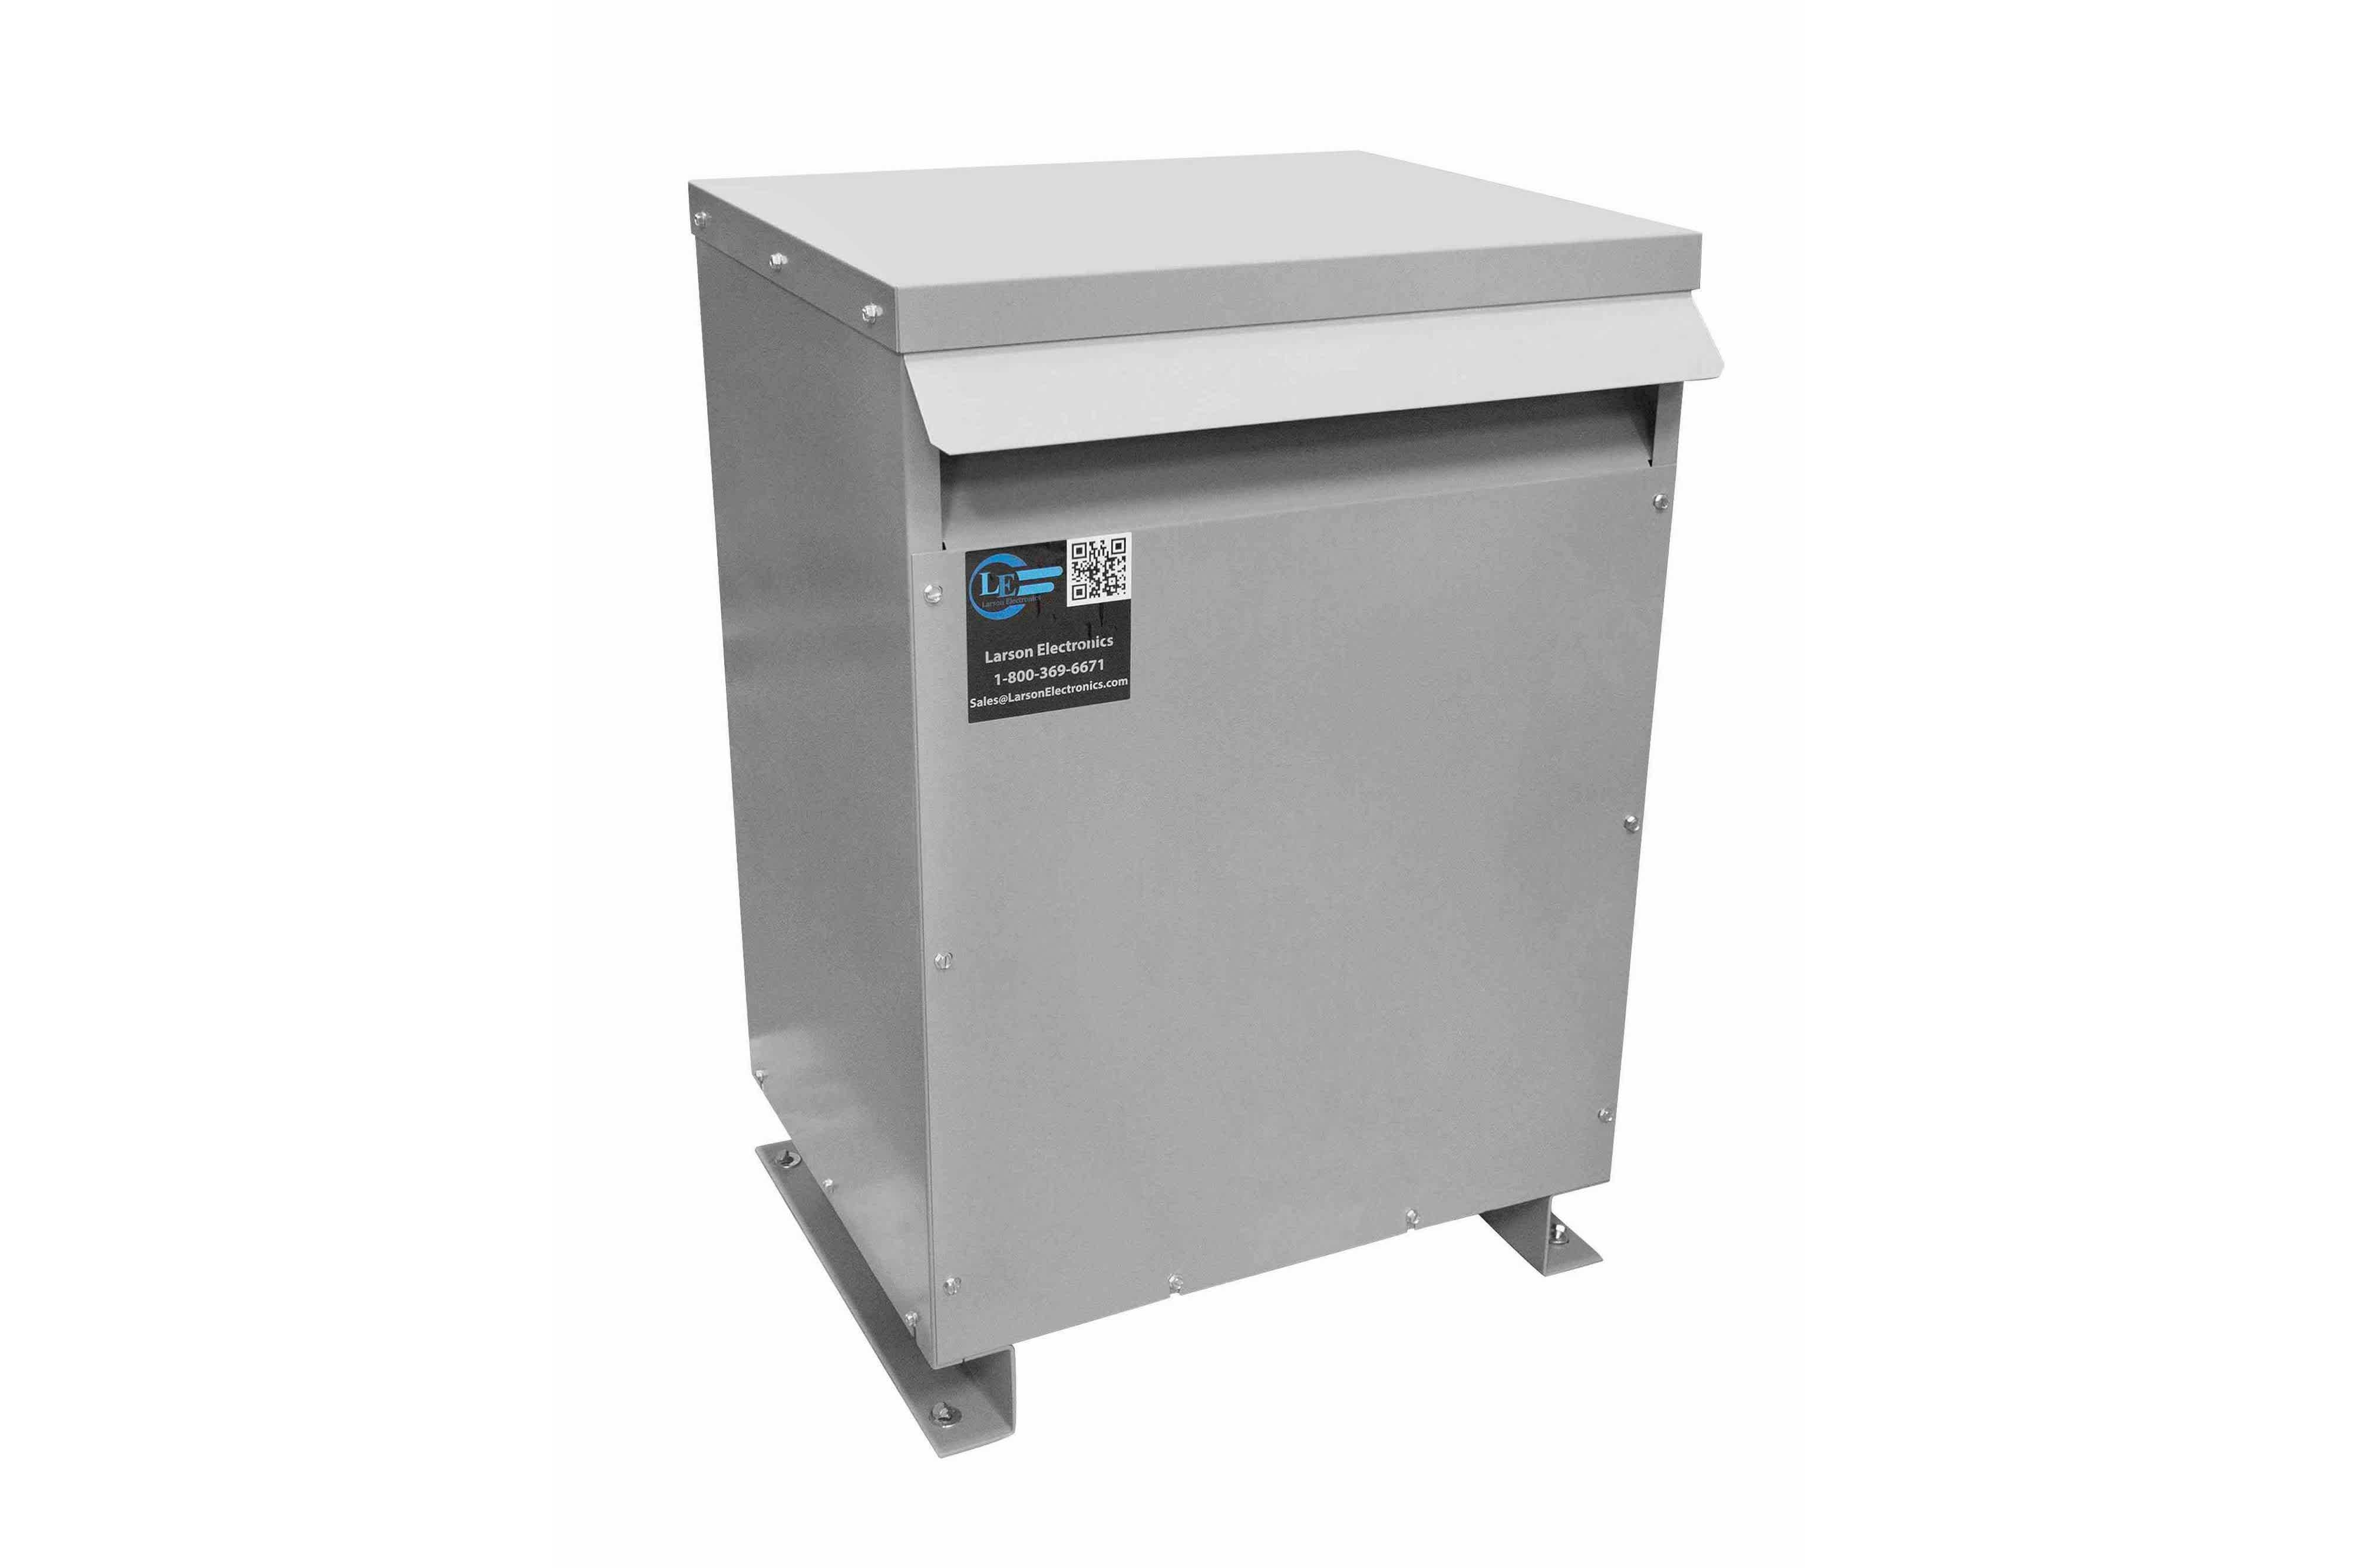 500 kVA 3PH DOE Transformer, 575V Delta Primary, 415Y/240 Wye-N Secondary, N3R, Ventilated, 60 Hz